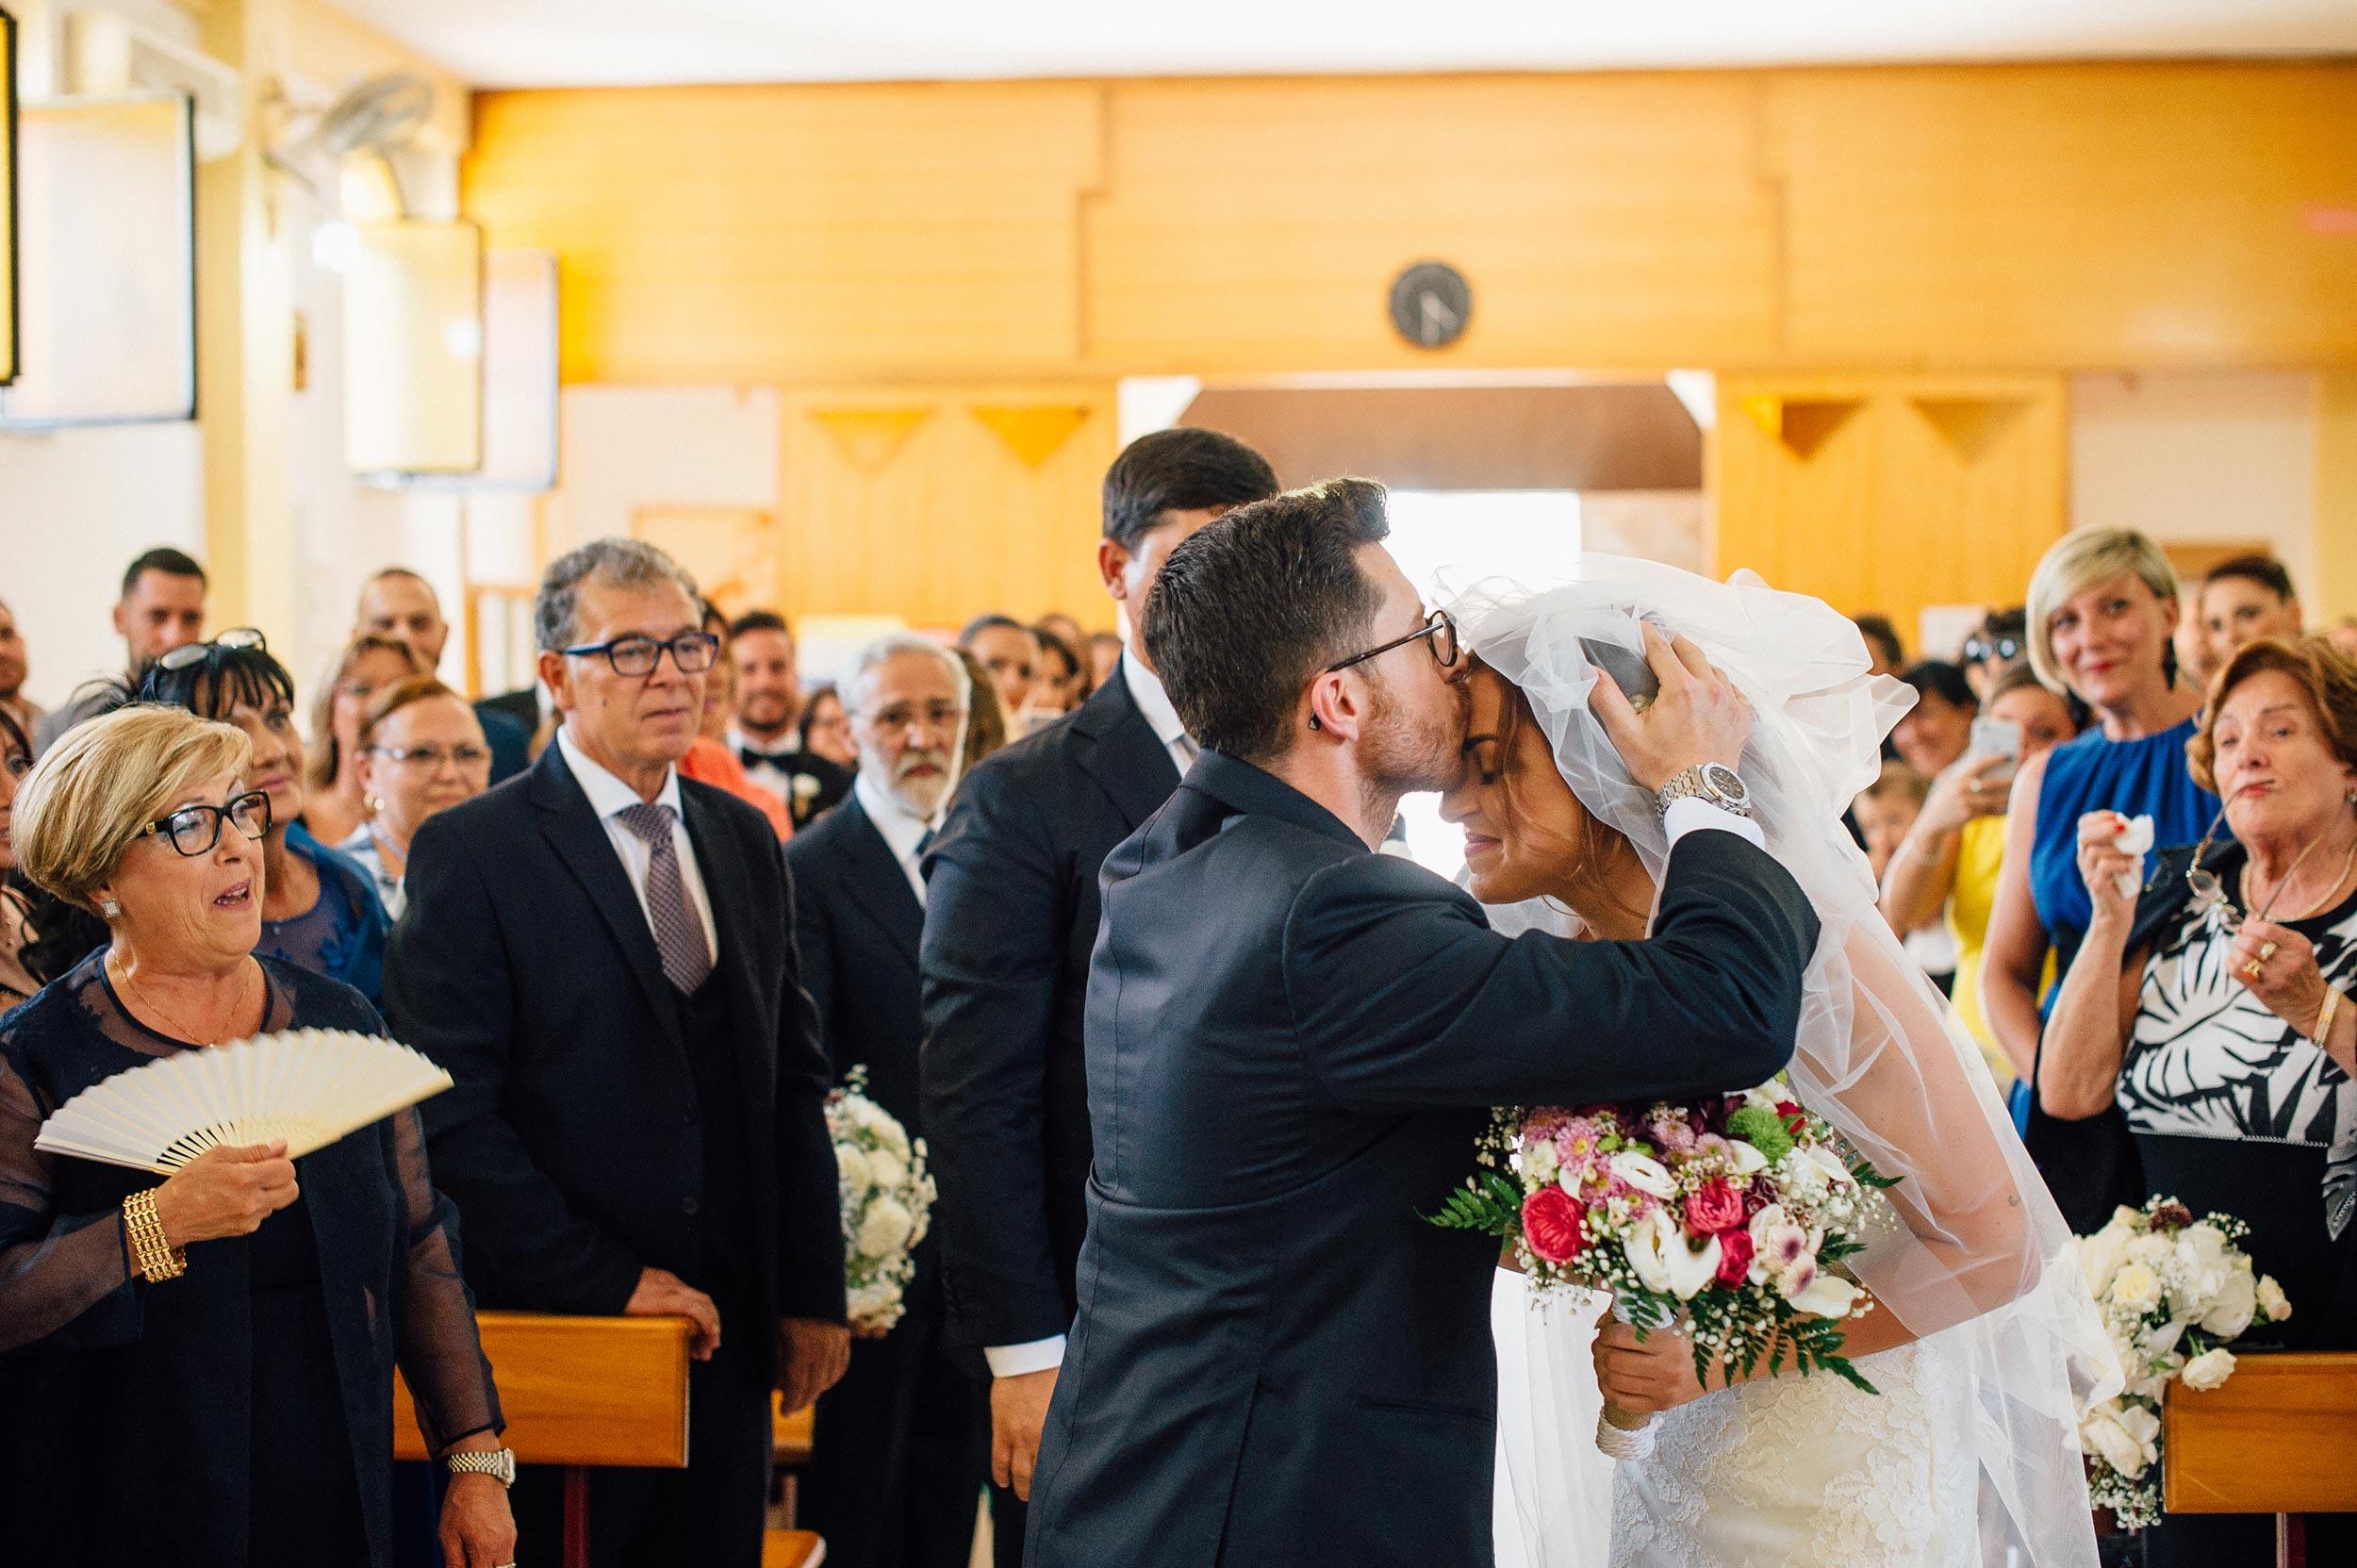 2016-Claudio-Teresa-Naples-Wedding-Photographer-Italy-Alessandro-Avenali-41.jpg